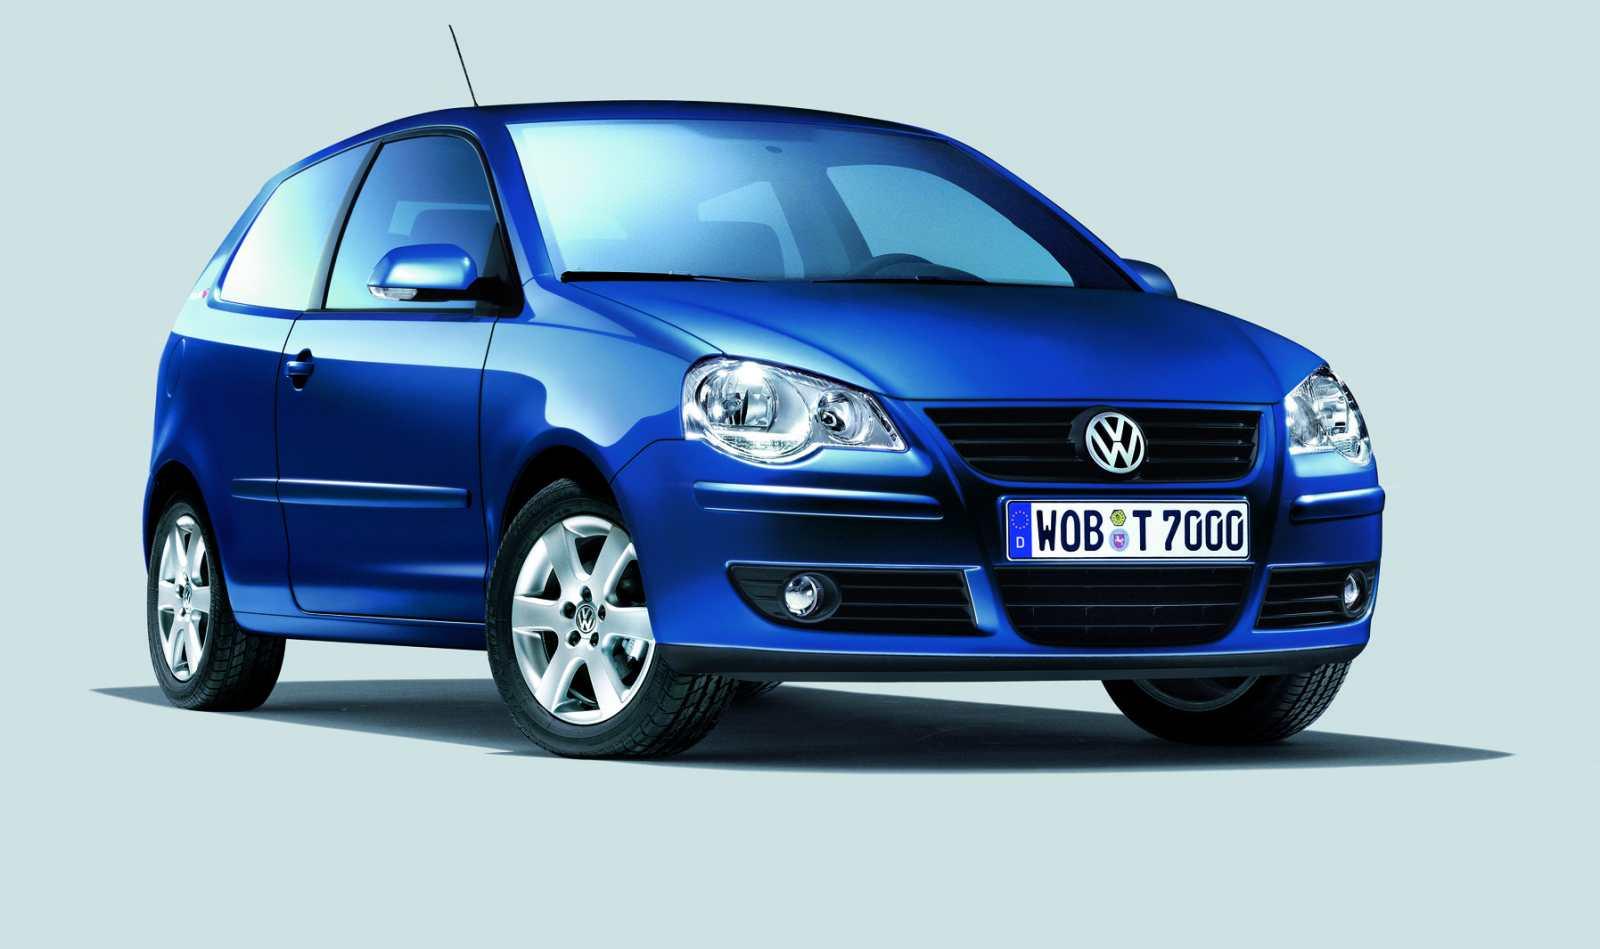 Volkswagen Polo Руководство По Эксплуатации